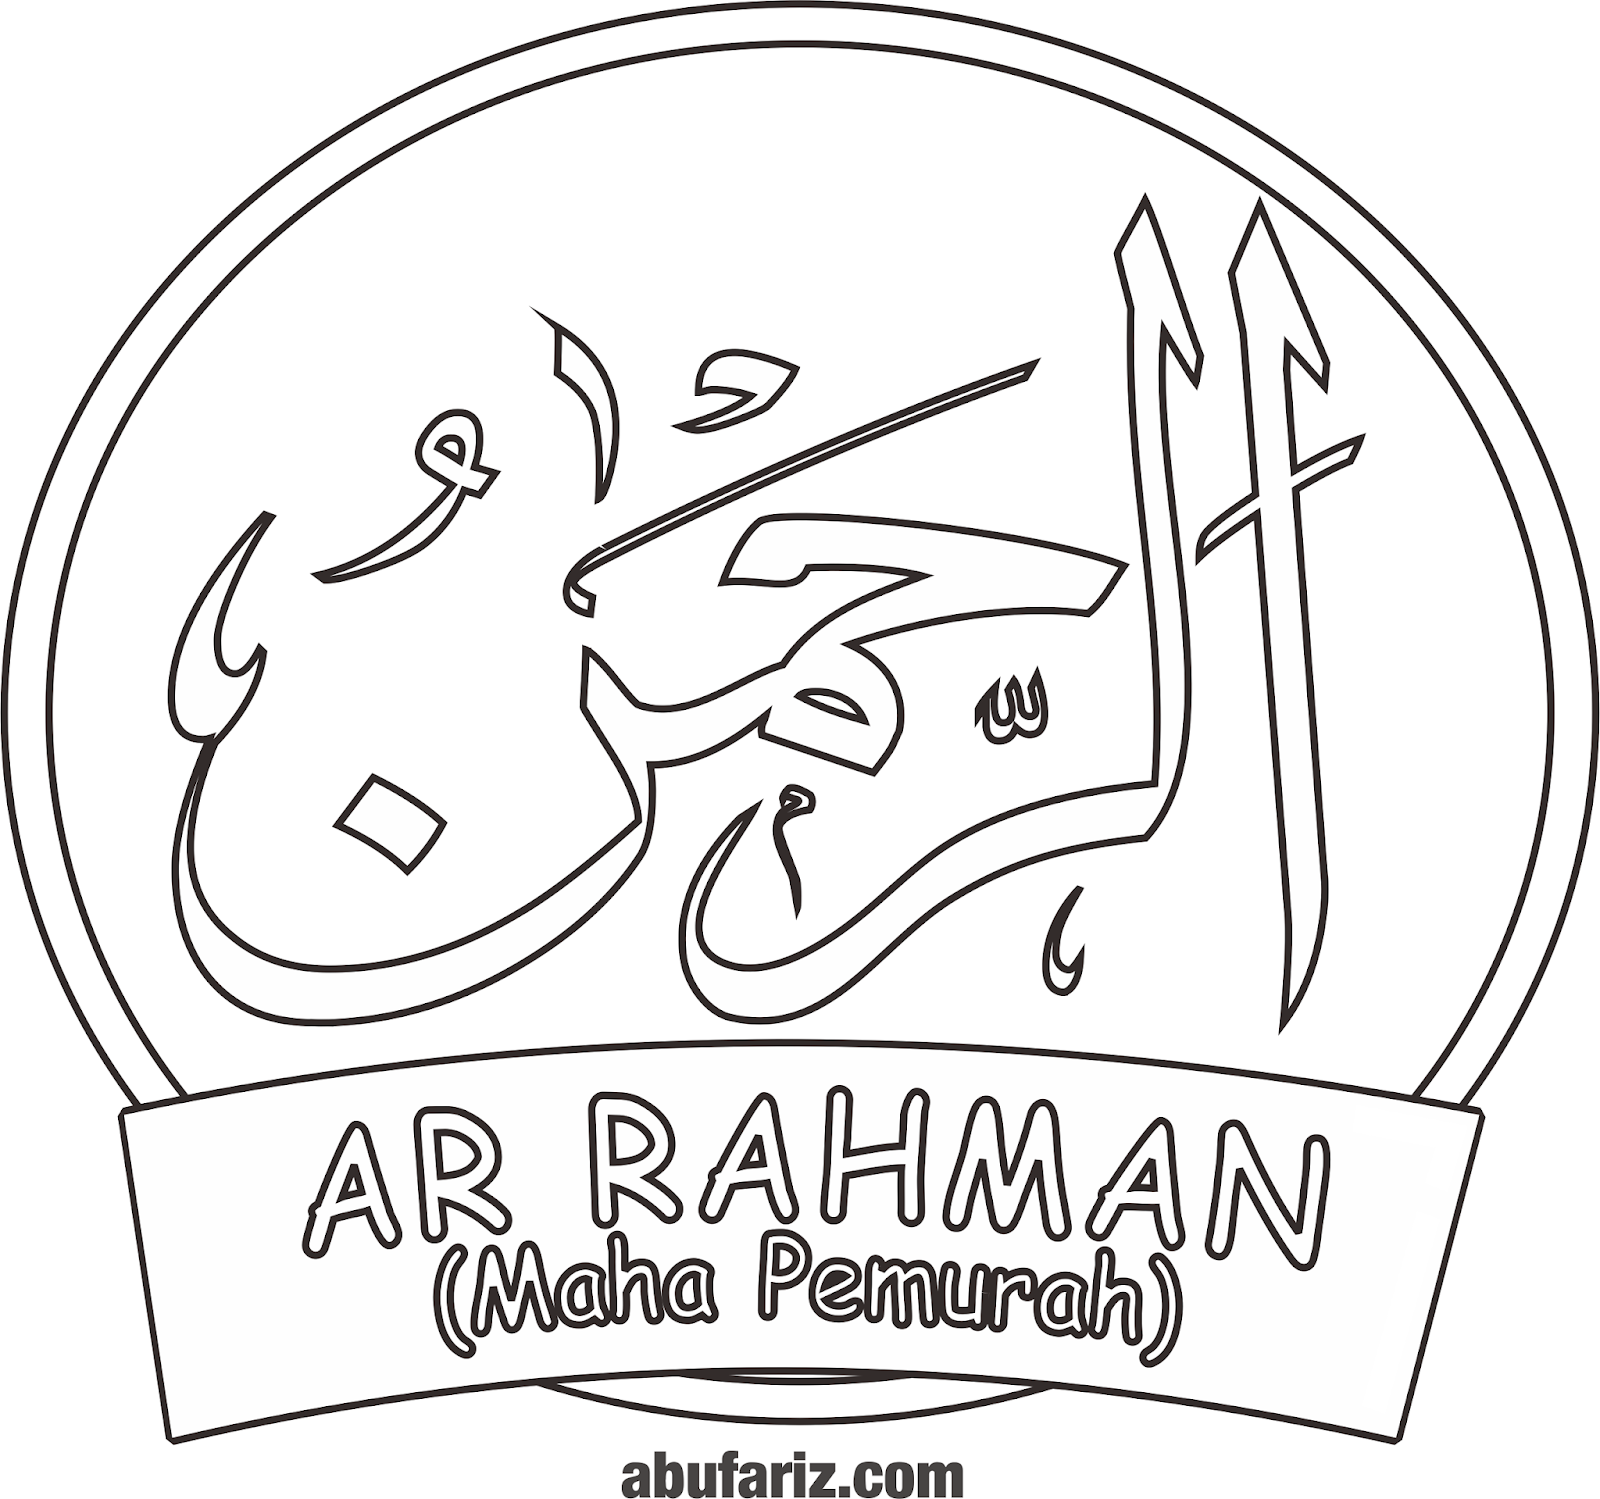 Kaligrafi Asmaul Husna Ar Rahman Cikimmcom